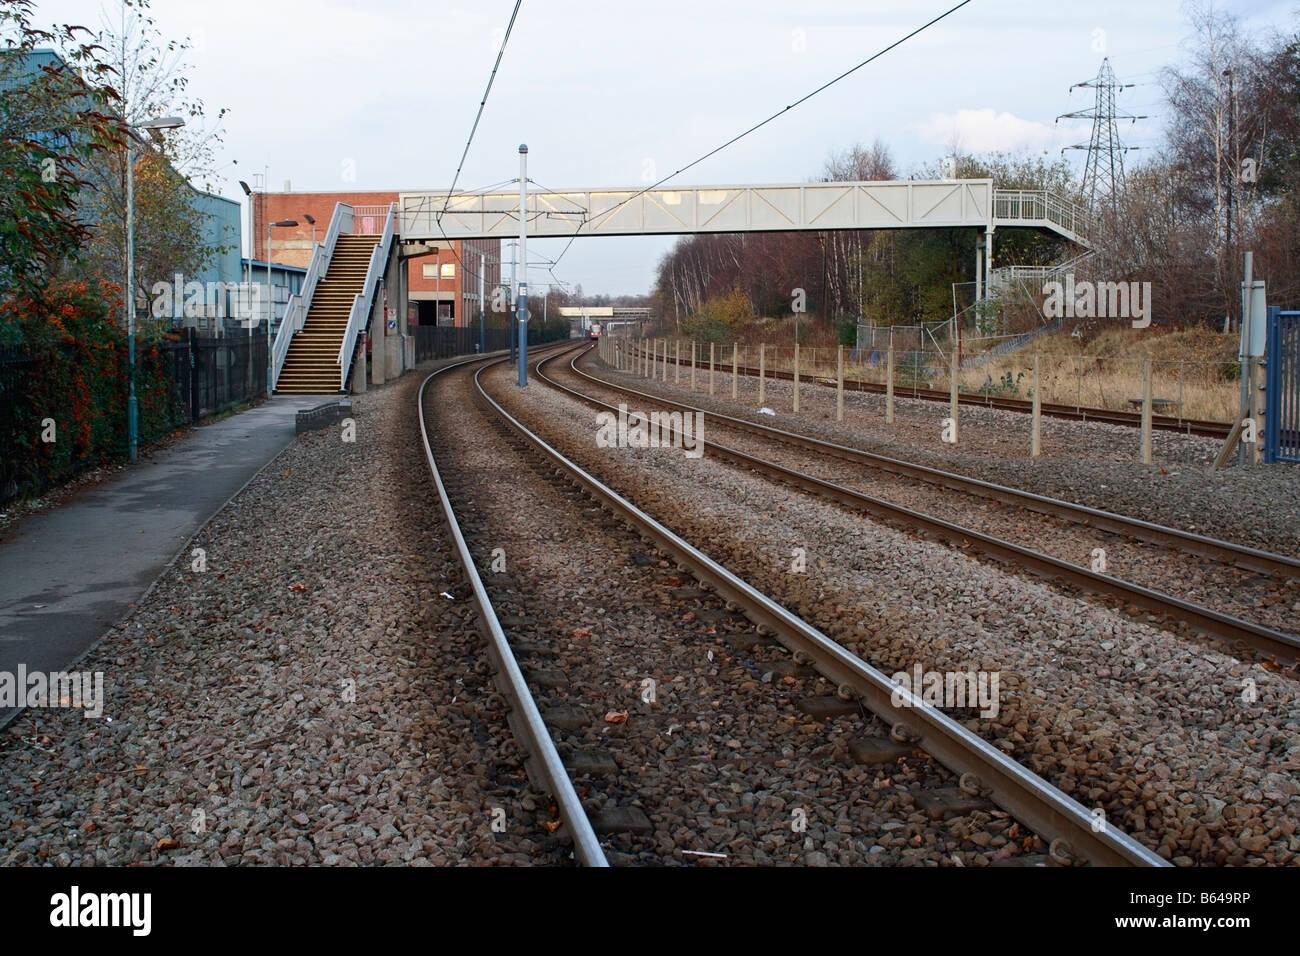 Footbridge across Light rail network in Sheffield - Stock Image